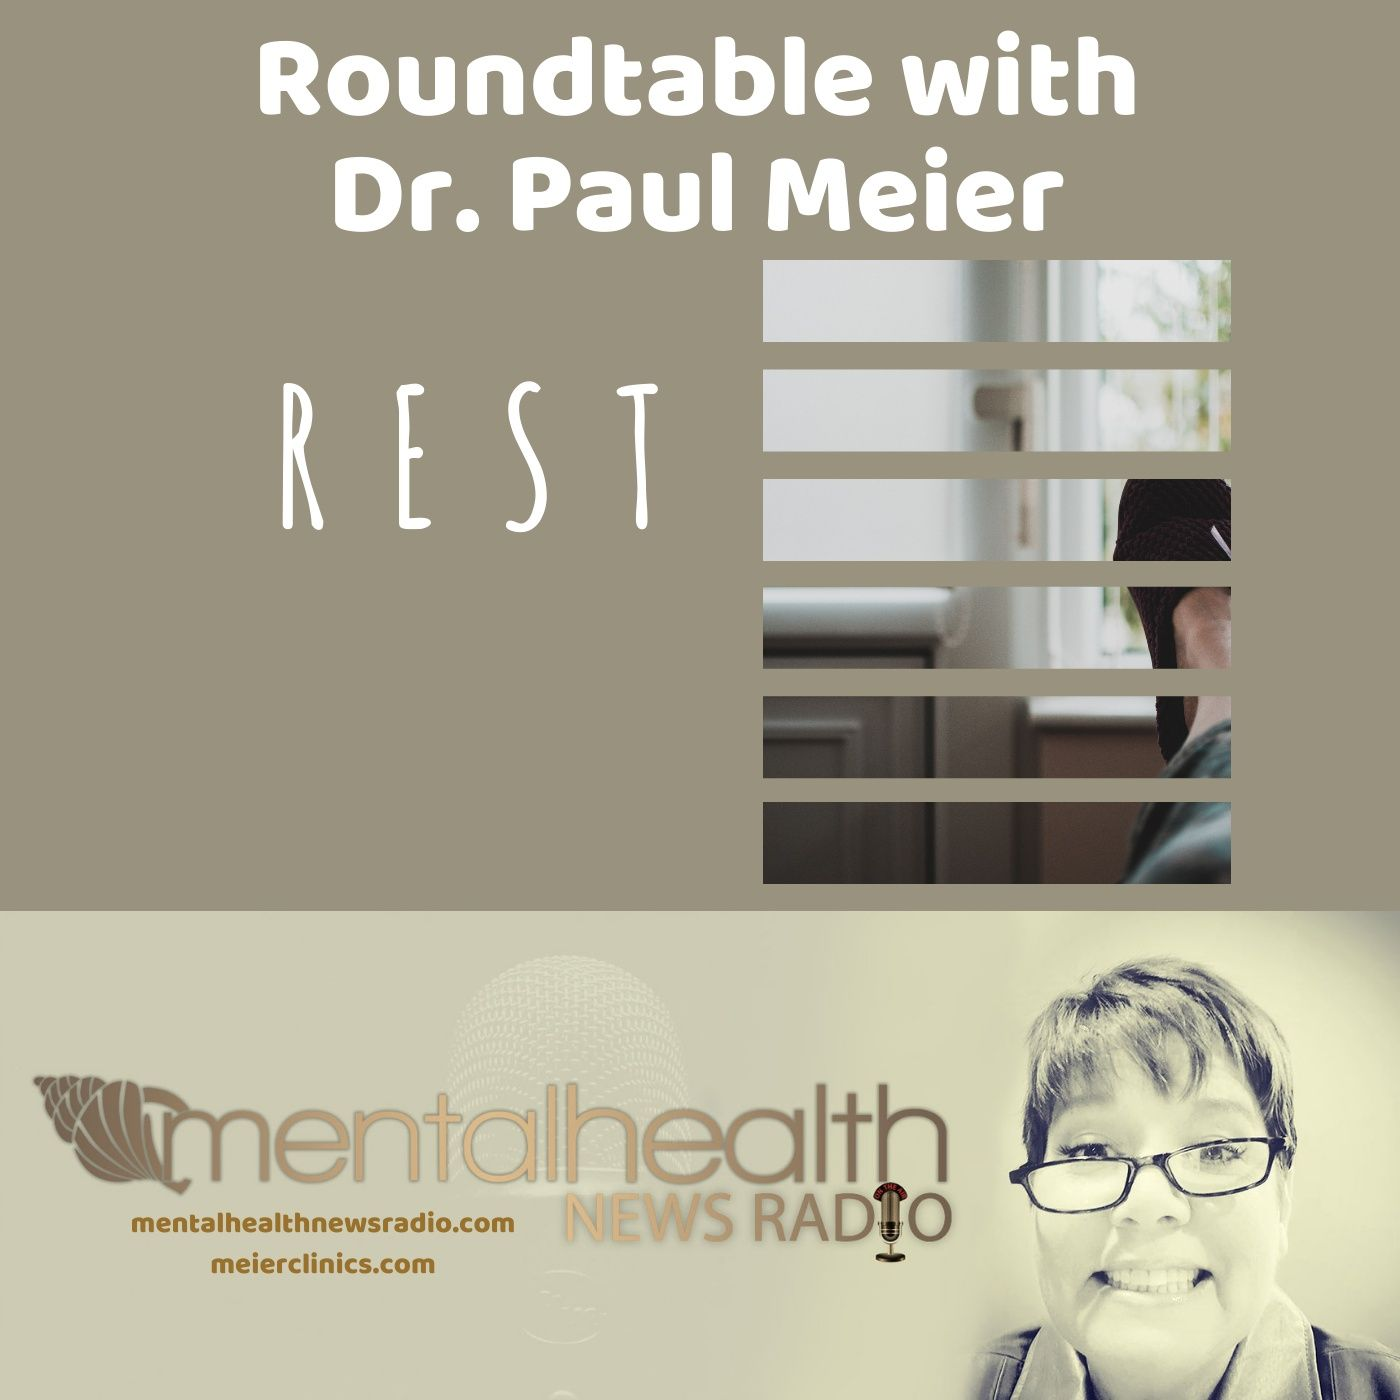 Mental Health News Radio - Roundtable with Dr. Paul Meier: REST